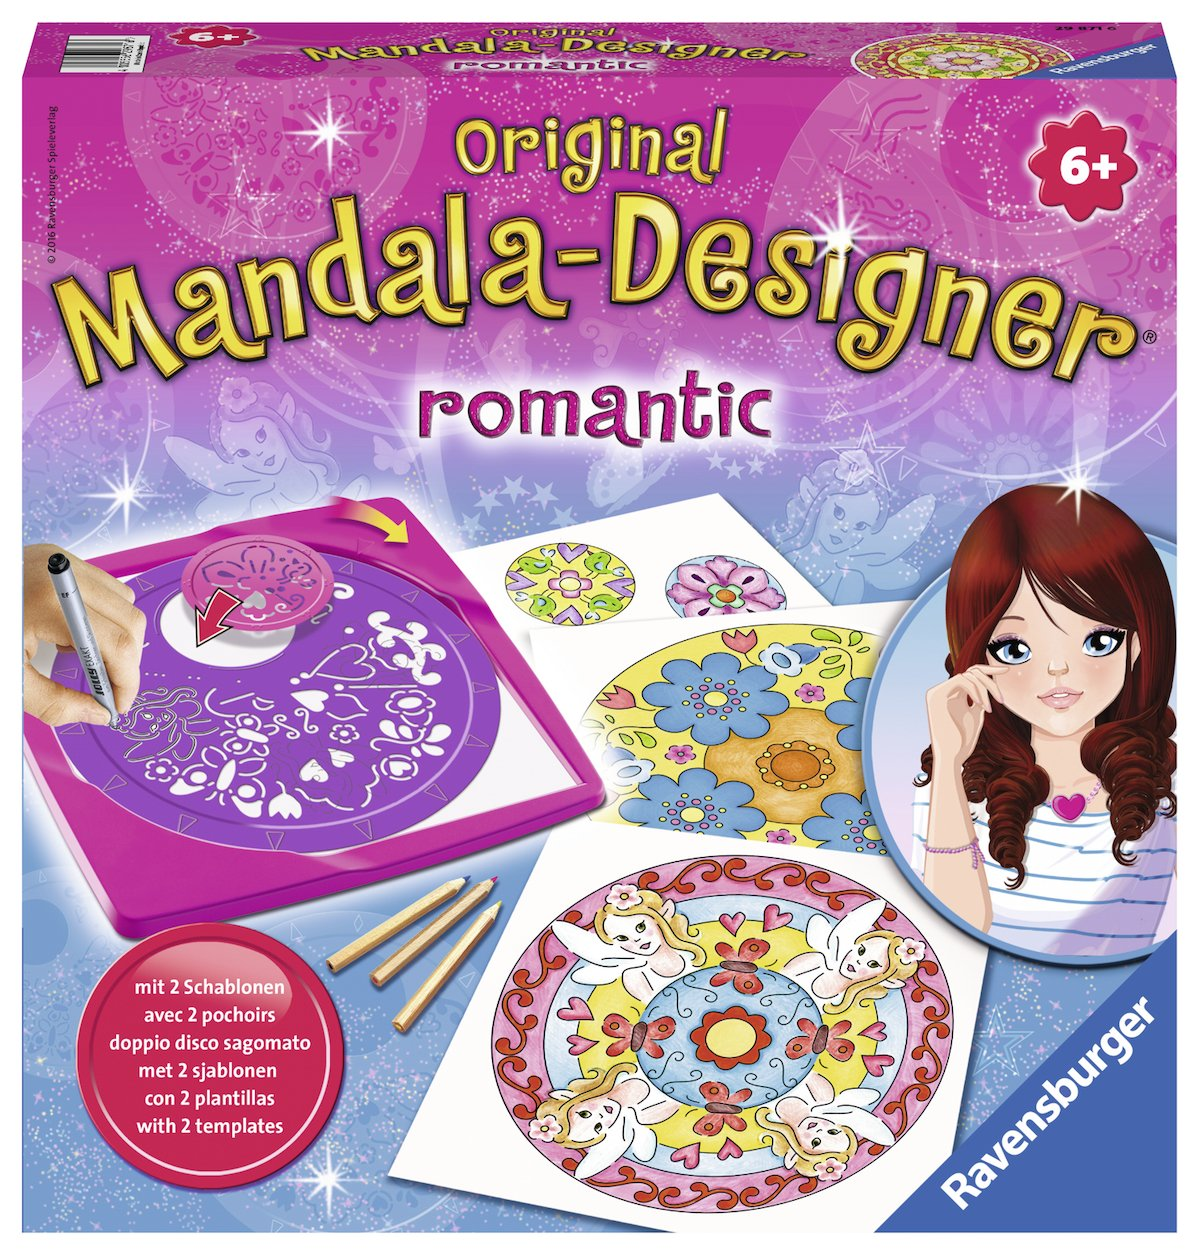 Mandala-Designer Romantic Mandala-Designer® Midi: Amazon.es: Libros en idiomas extranjeros